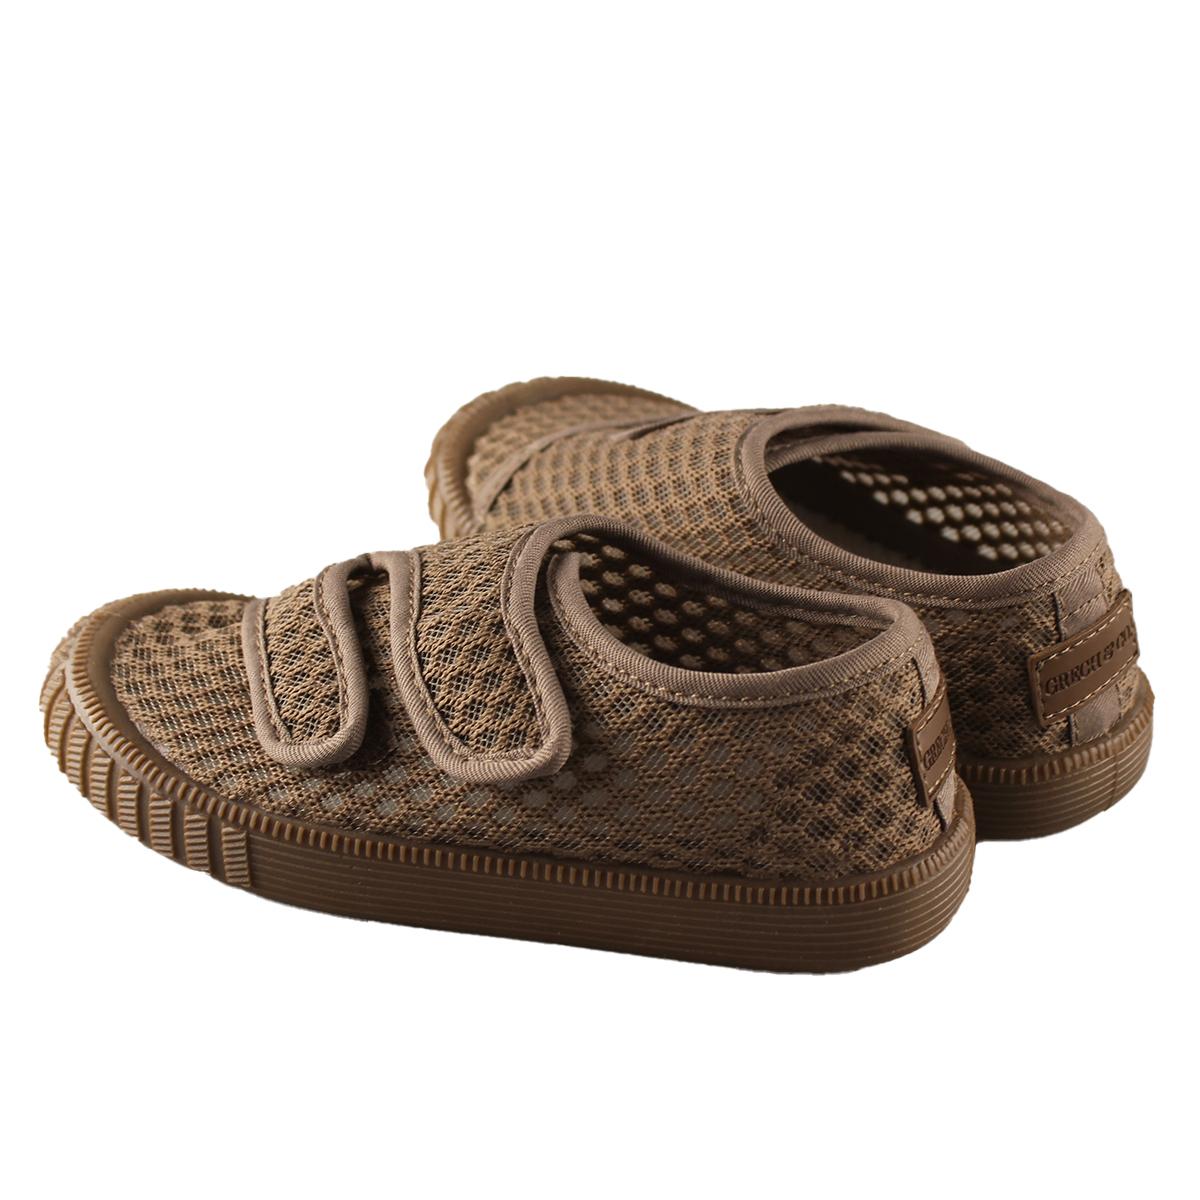 Chaussons & Chaussures Baskets Respirantes à Scratch Stone - 27 Baskets Respirantes à Scratch Stone - 27